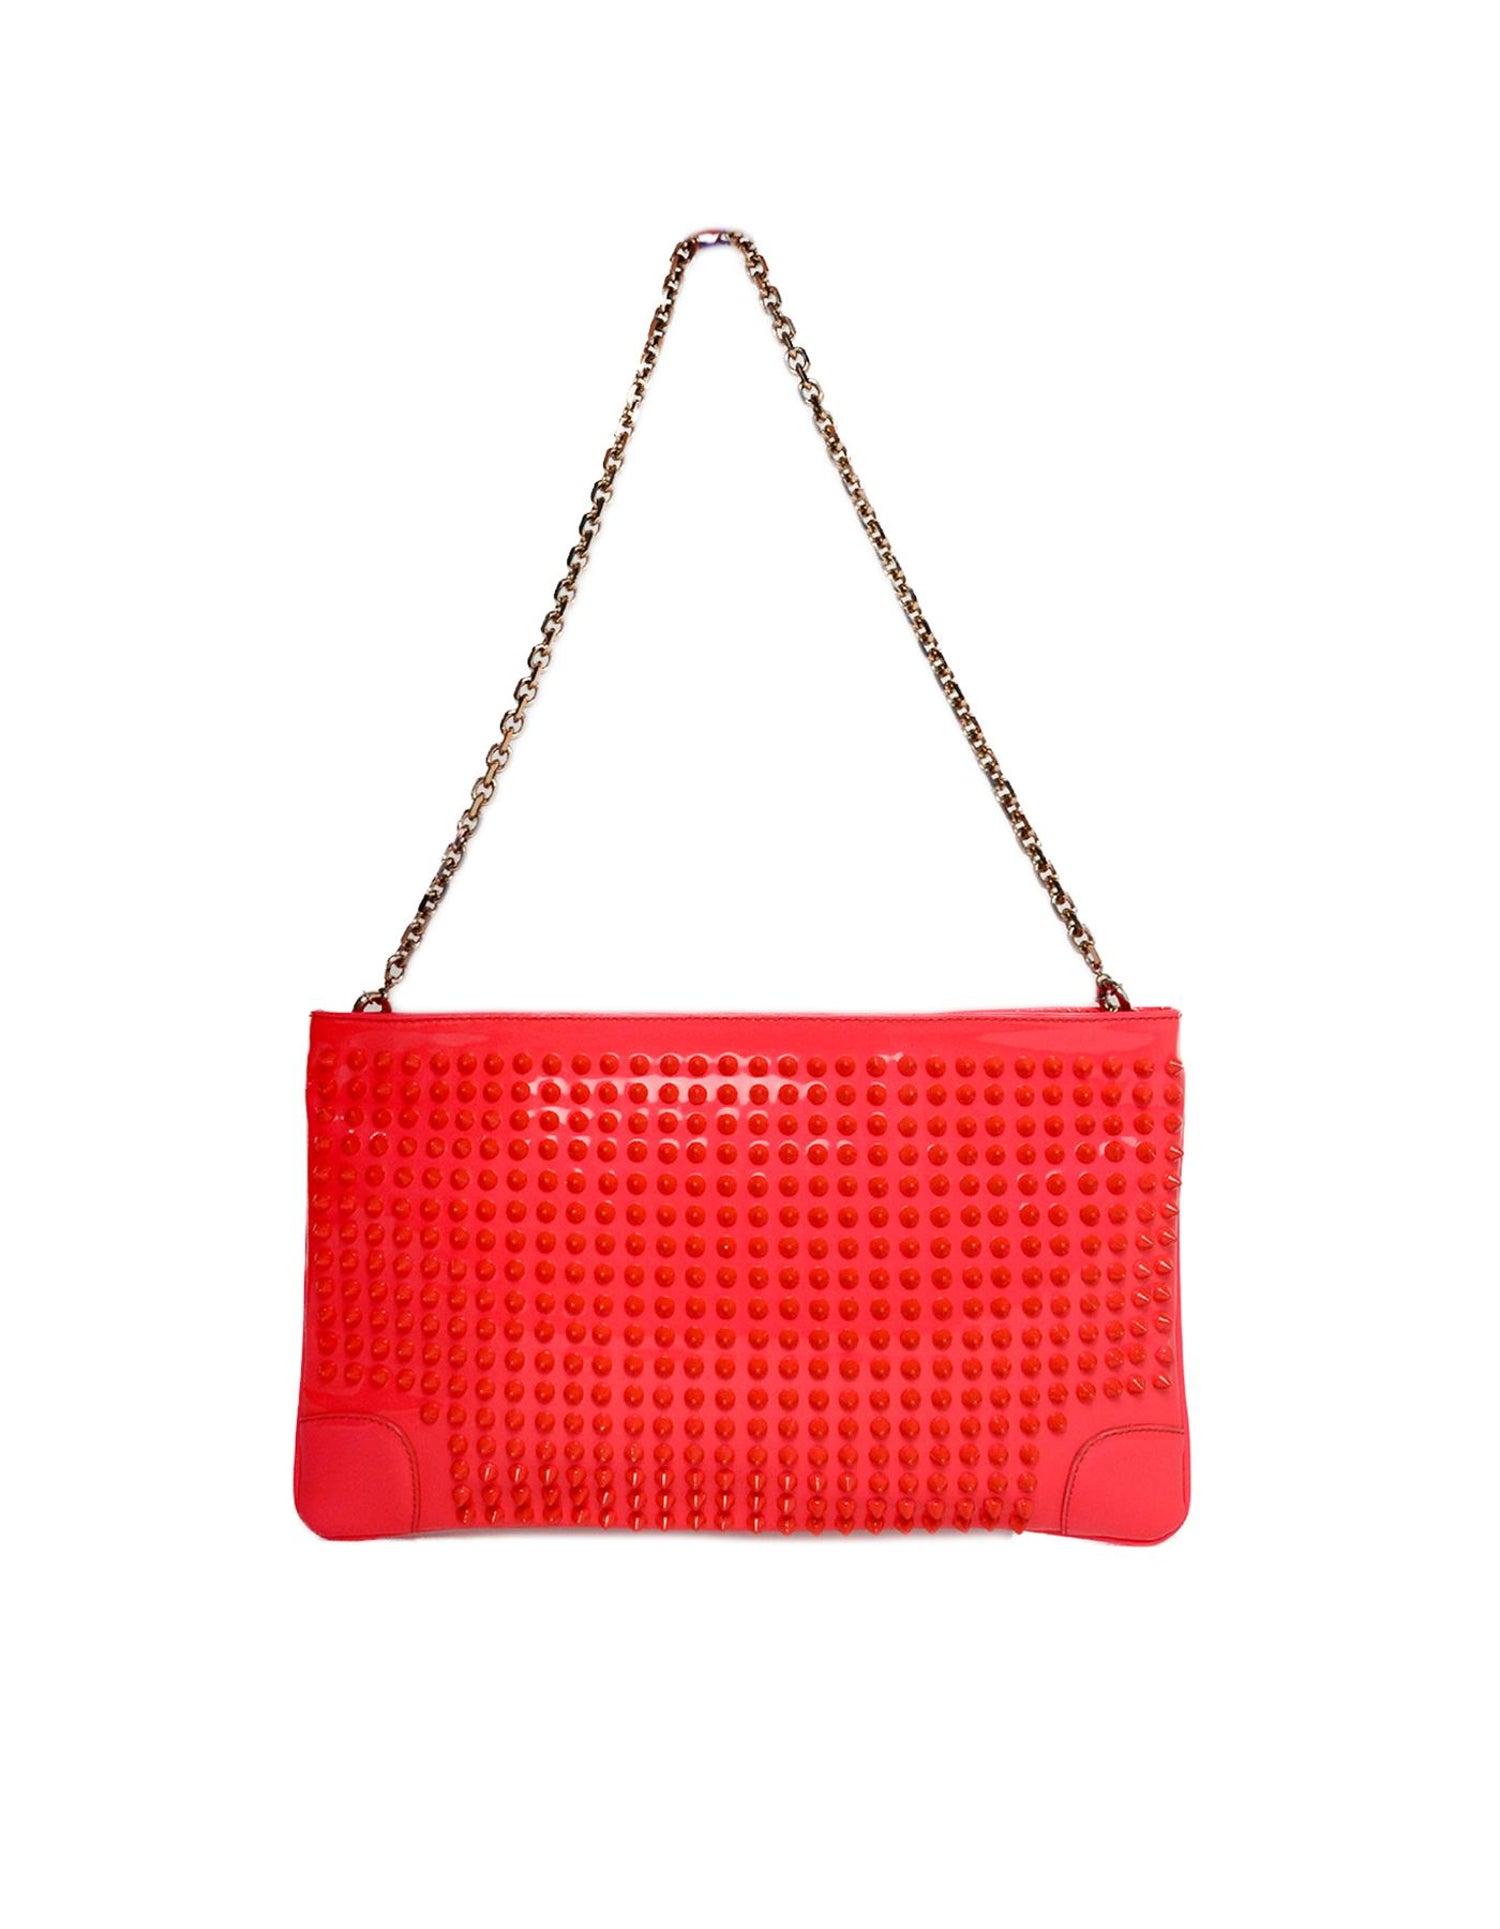 bbd3b9c5989 Christian Louboutin Neon Patent Leather Loubiposh Spiked Clutch/Pochette Bag